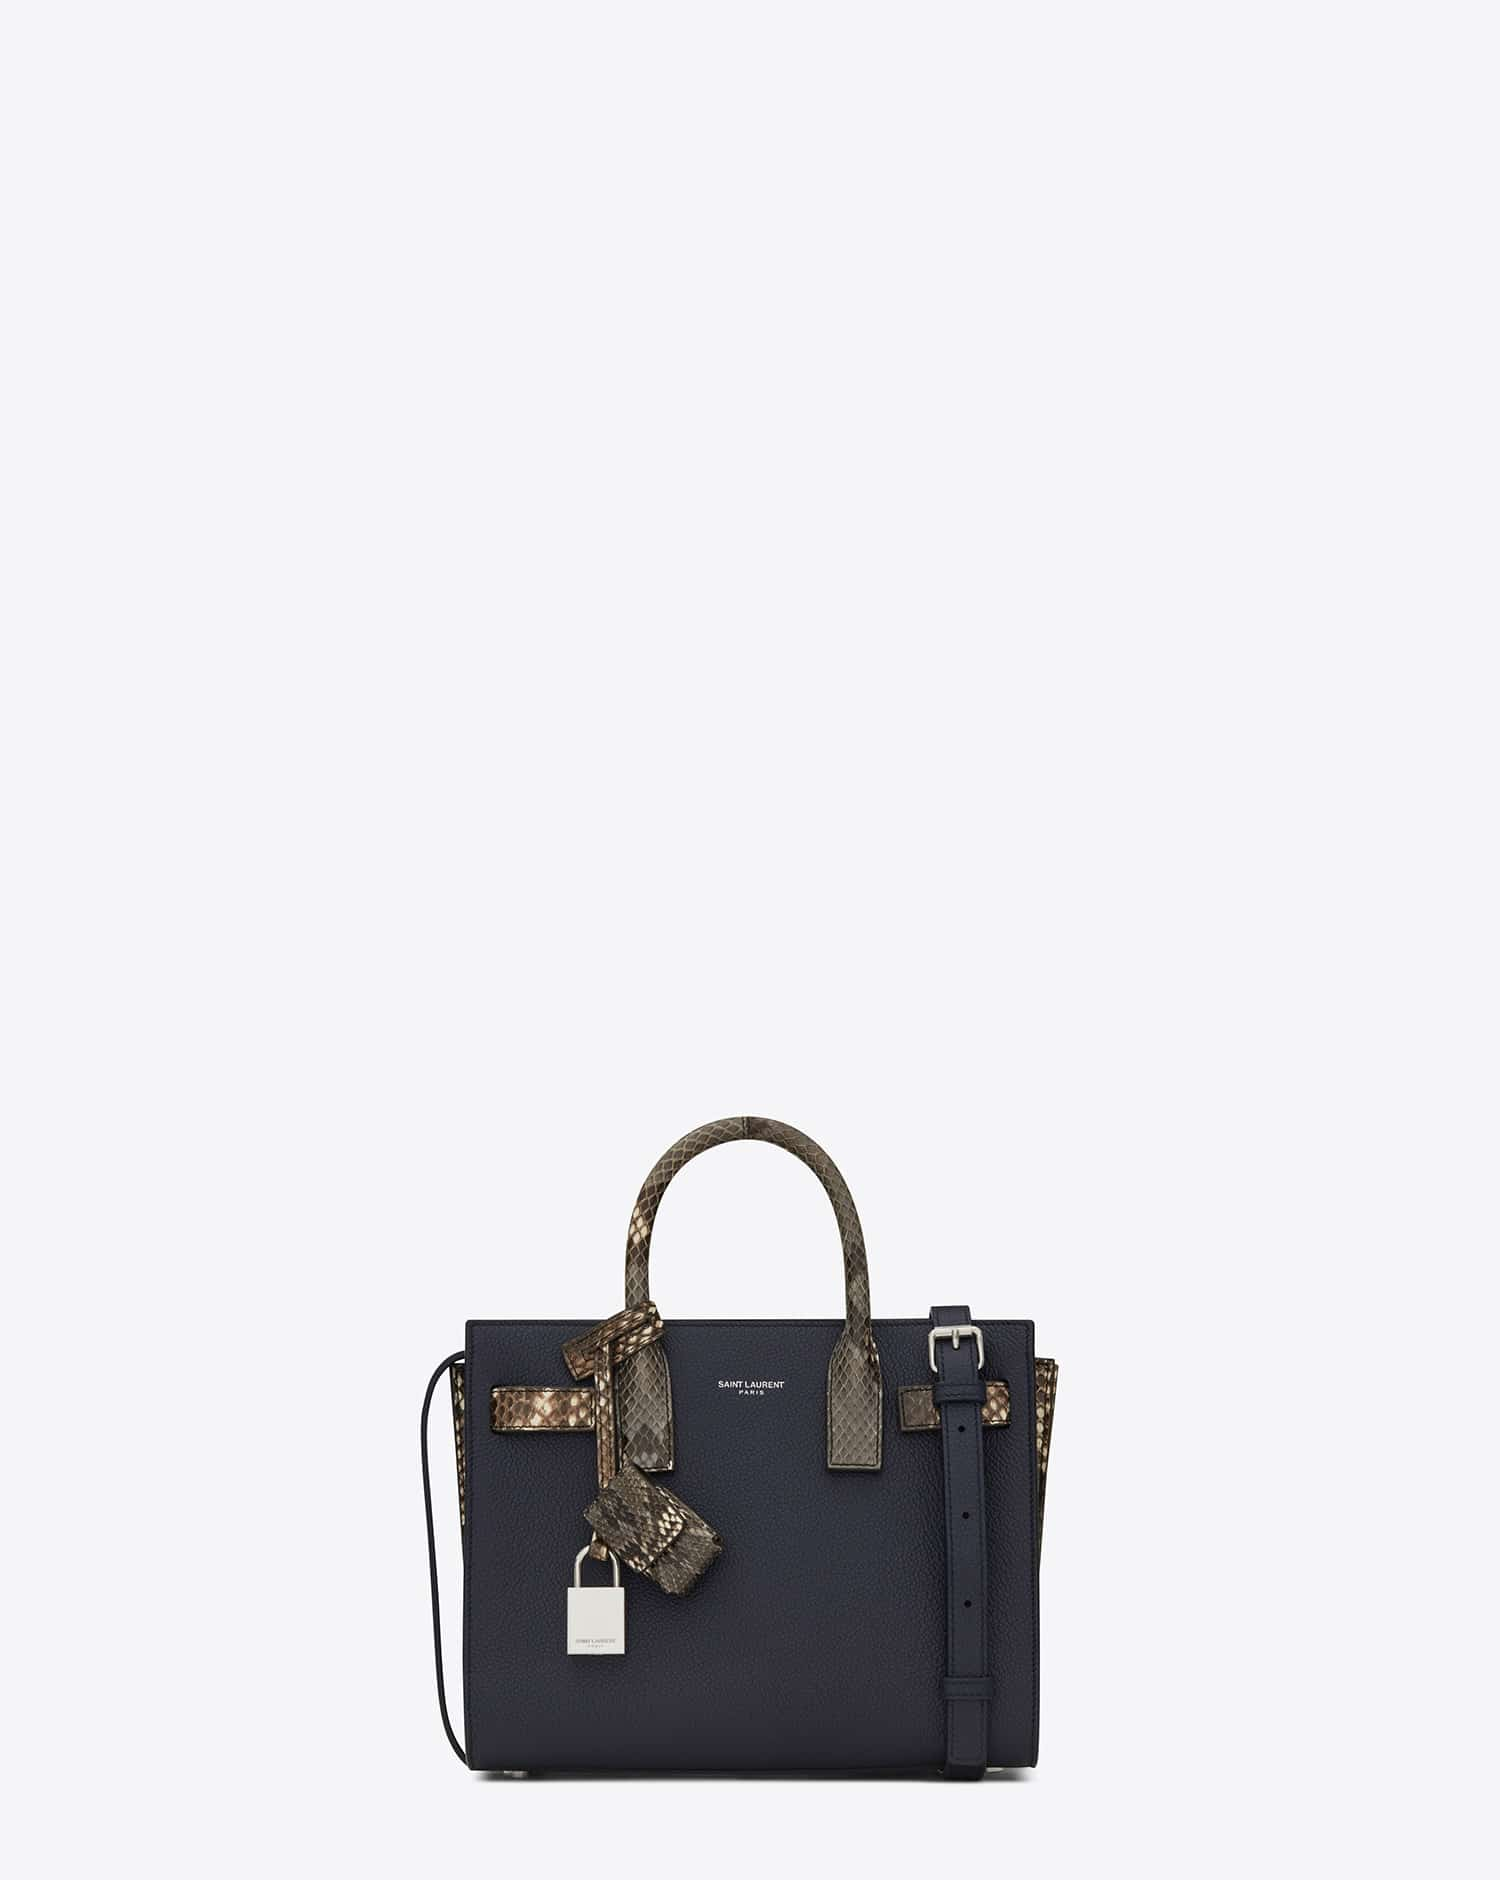 Saint laurent cruise 2017 bag collection